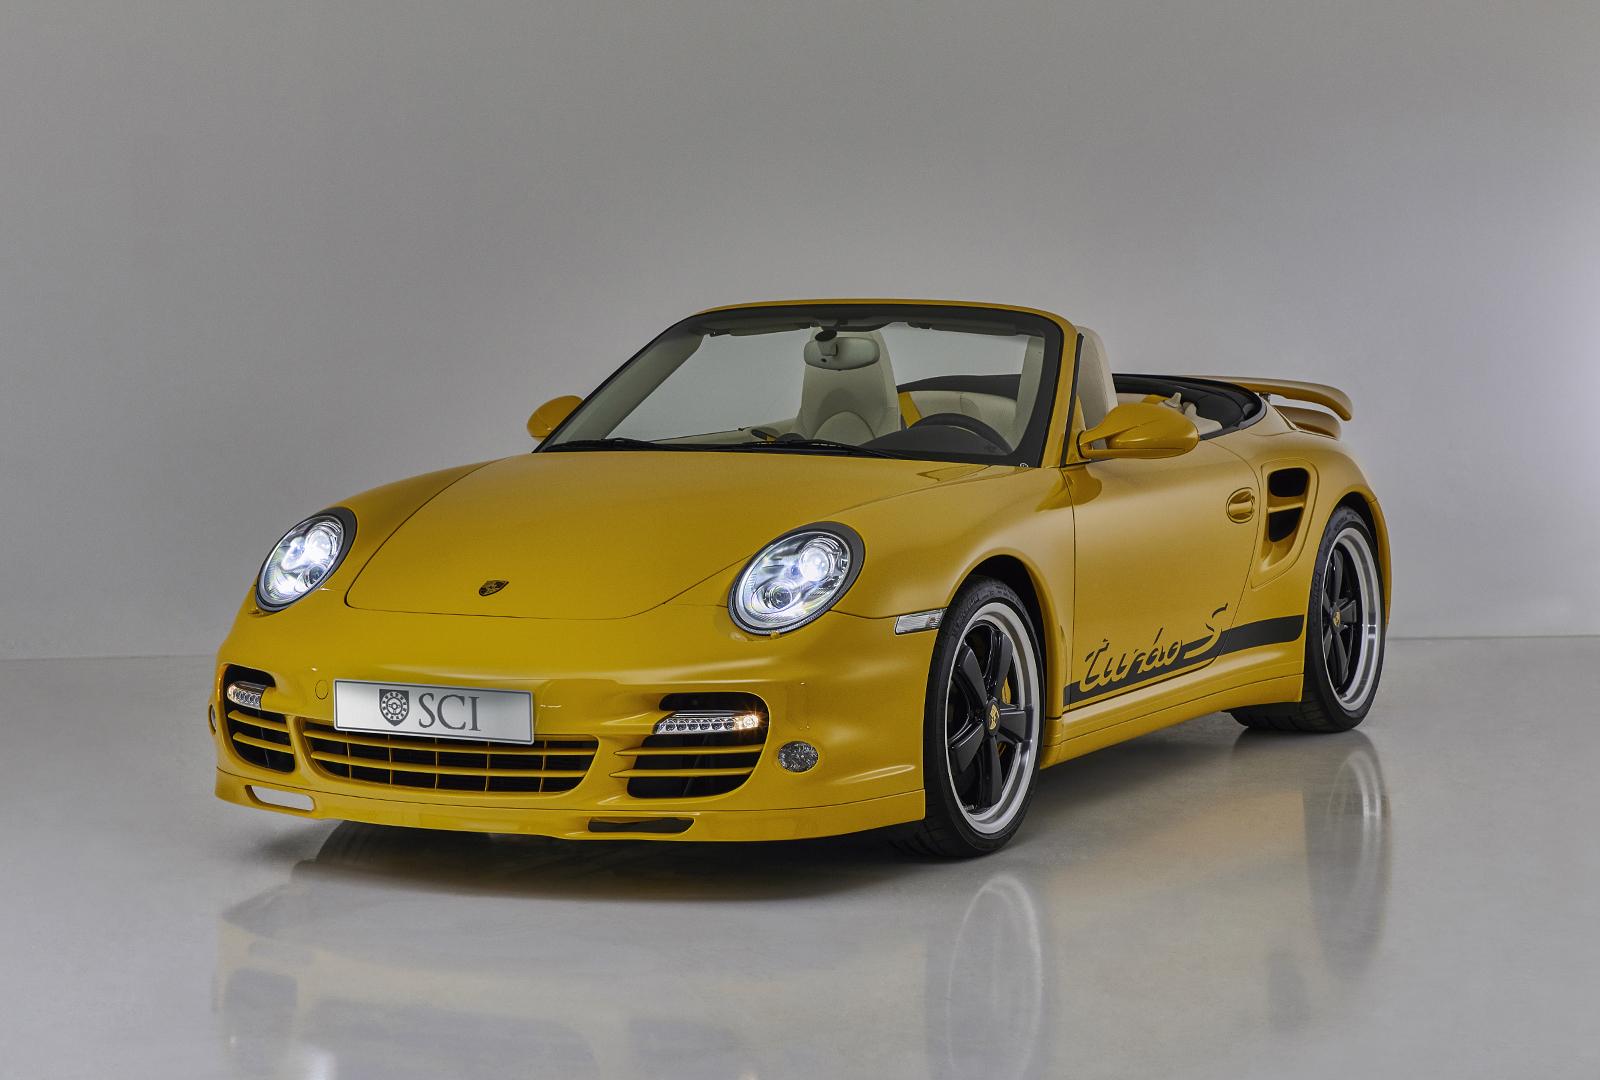 Porsche 997.2 Turbo S